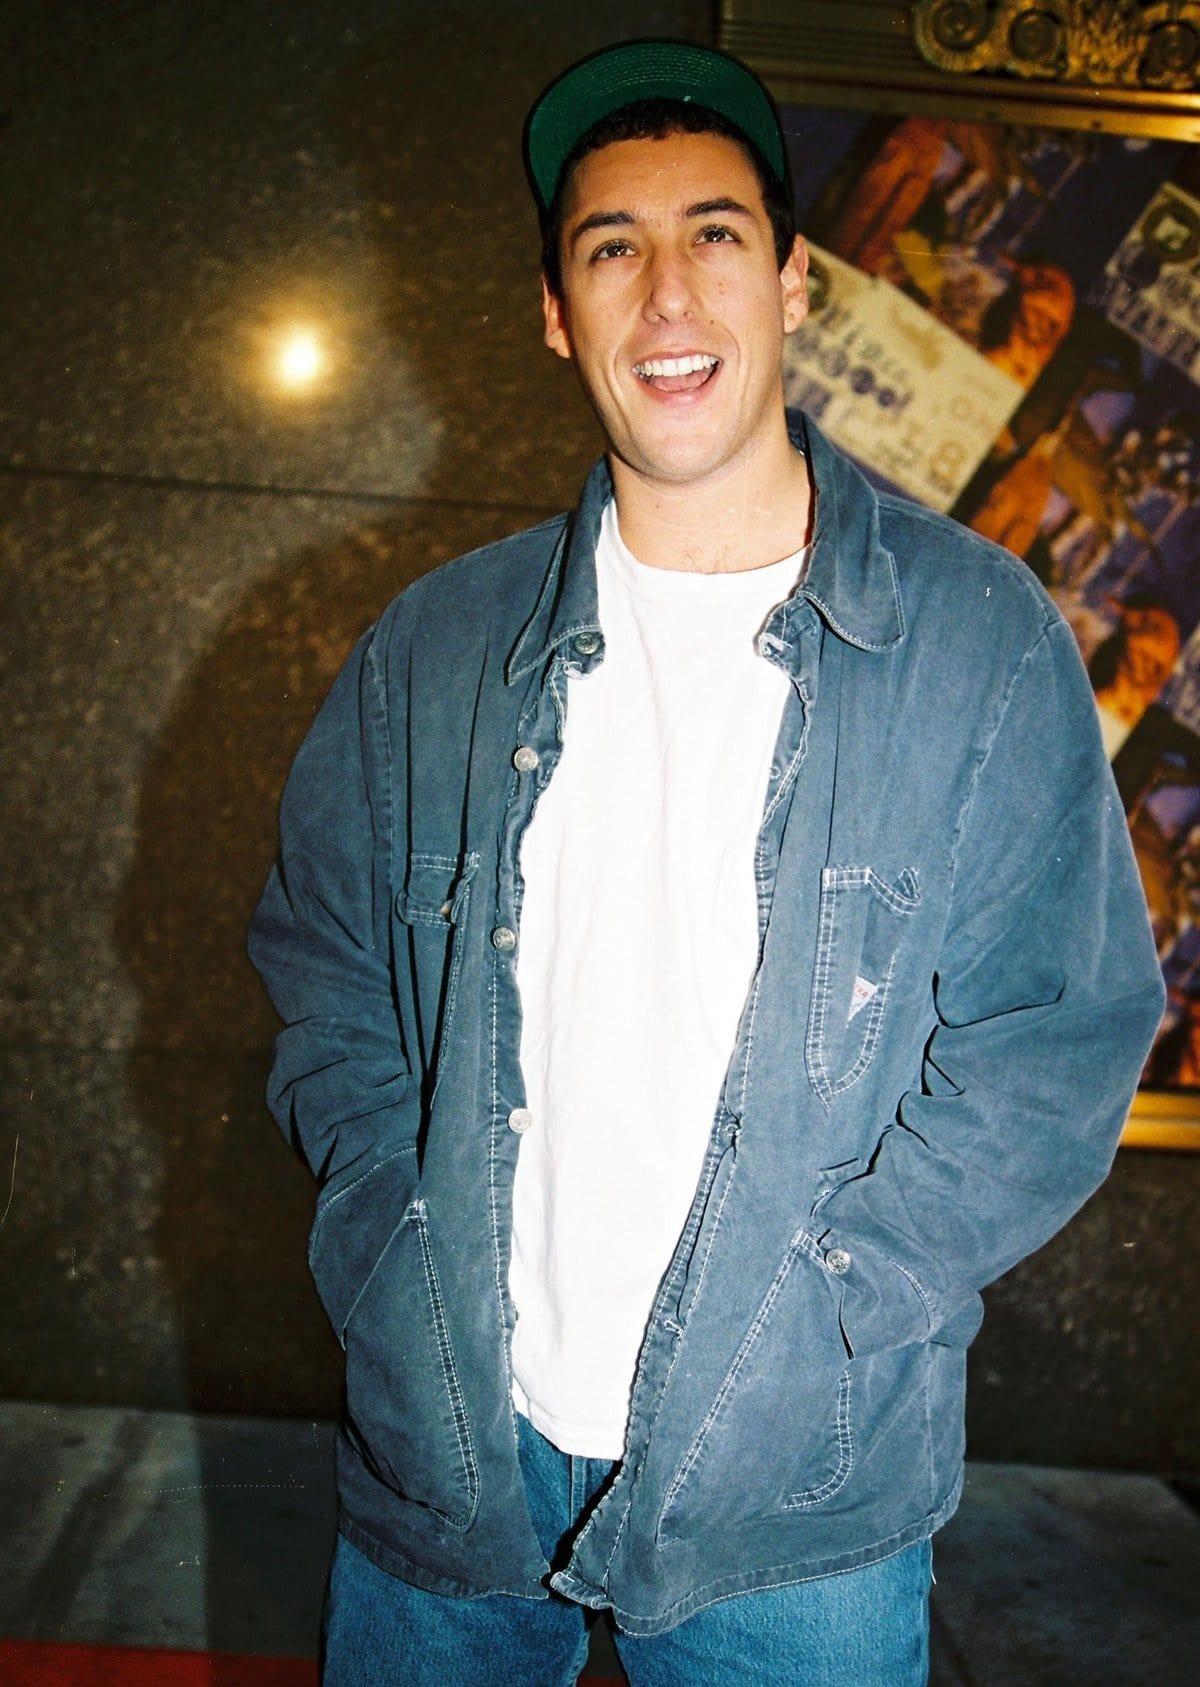 Adam Sandler at the 1994 MTV Video Music Awards